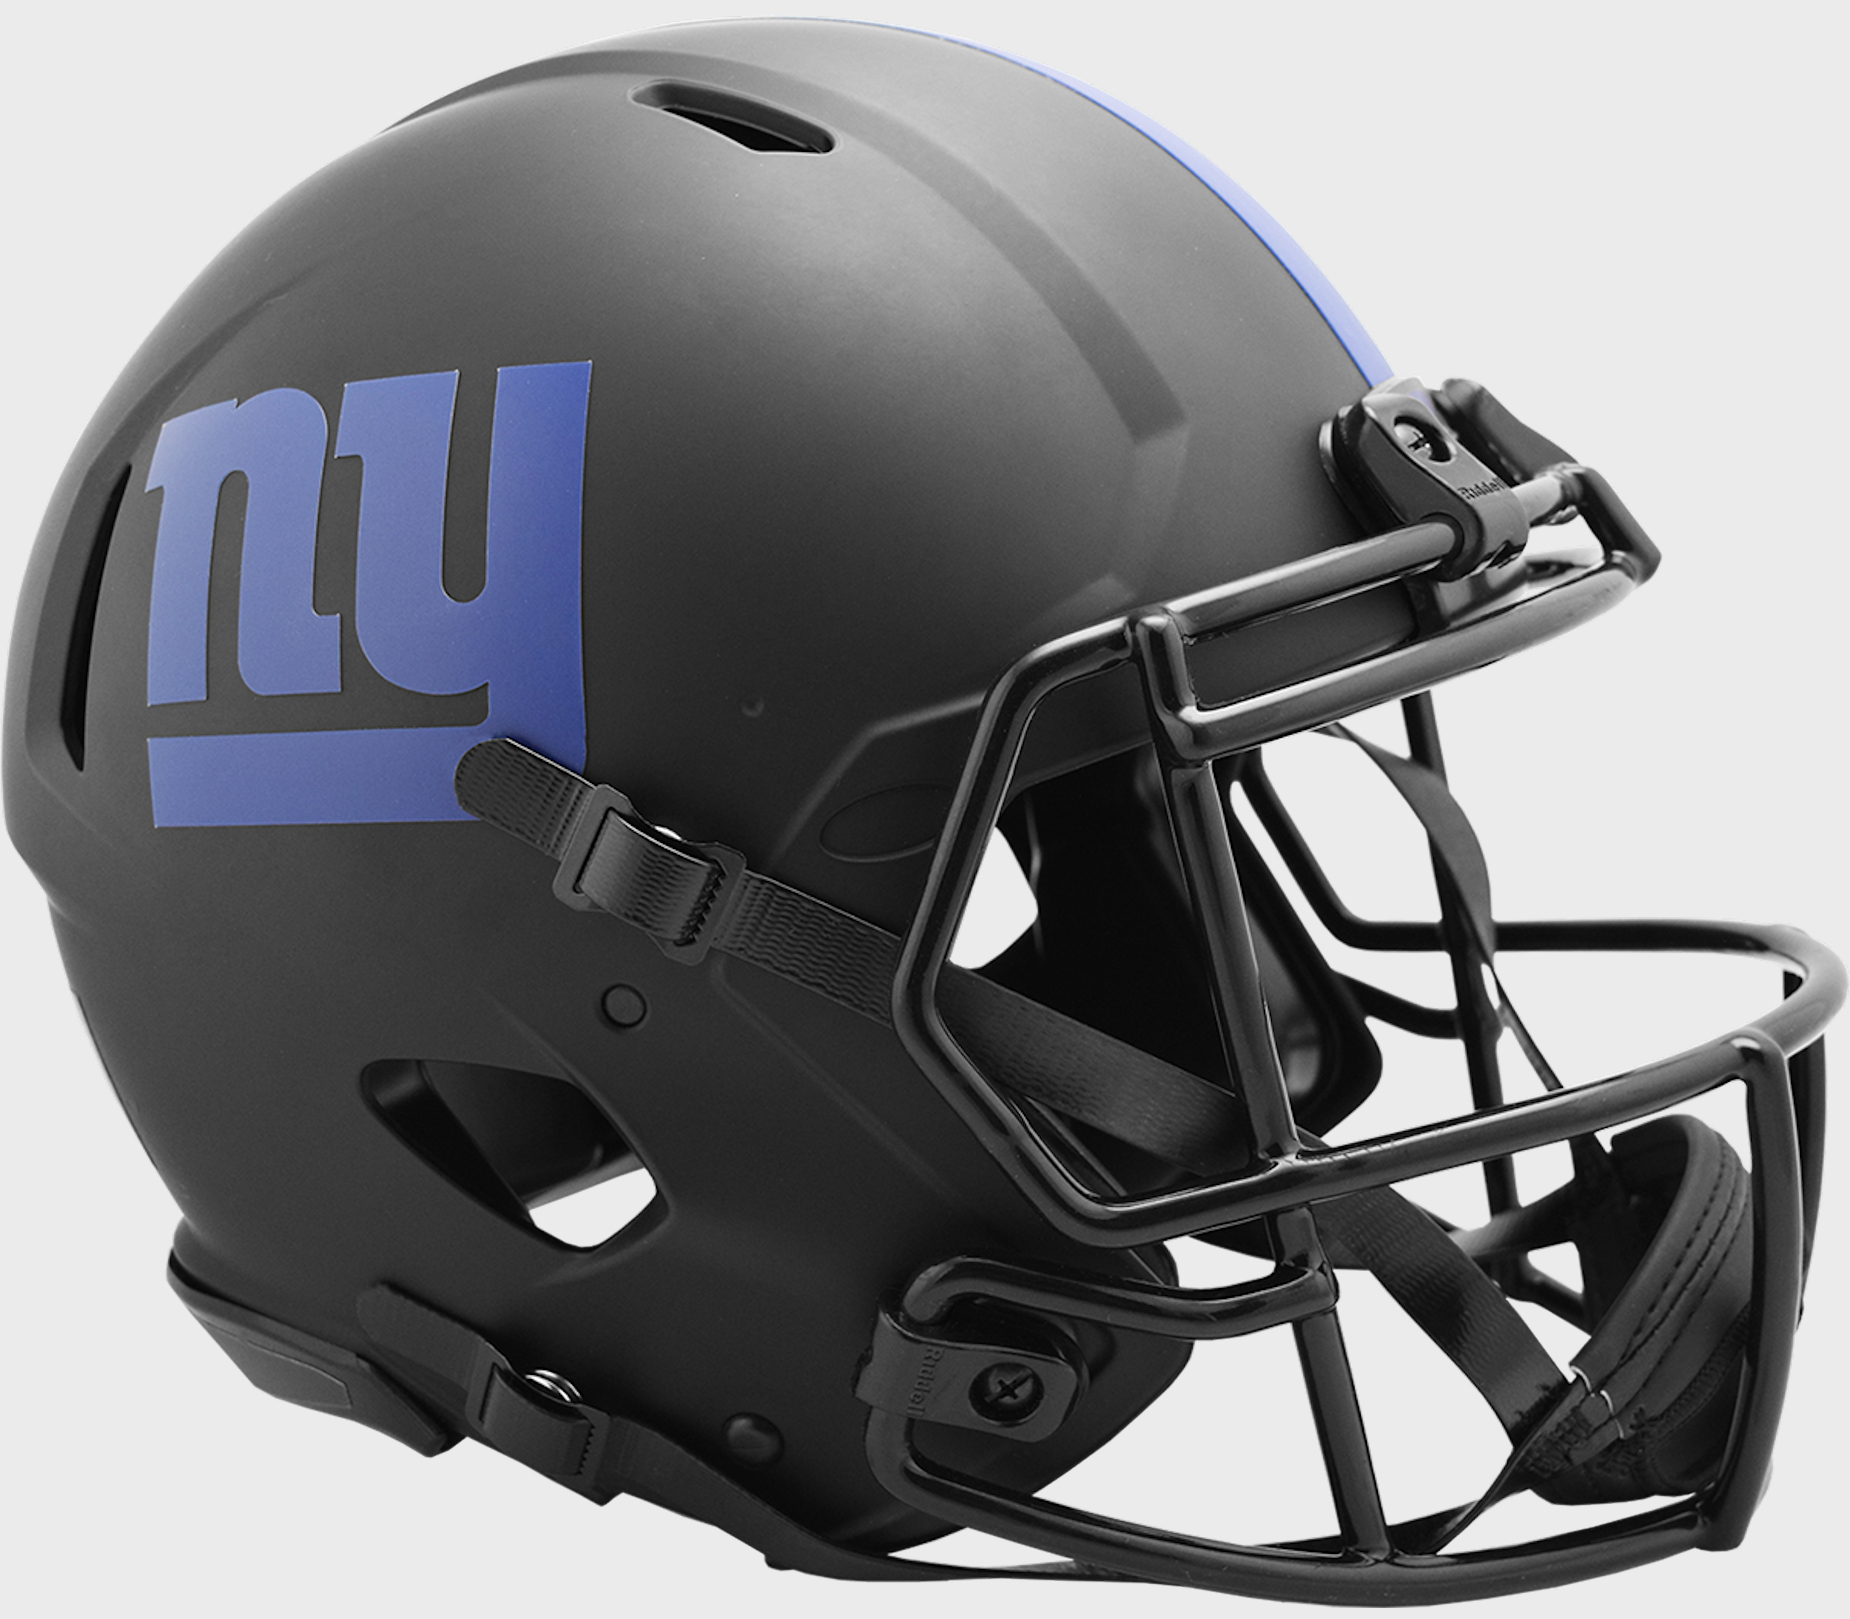 New York Giants Speed Football Helmet <B>ECLIPSE</B>